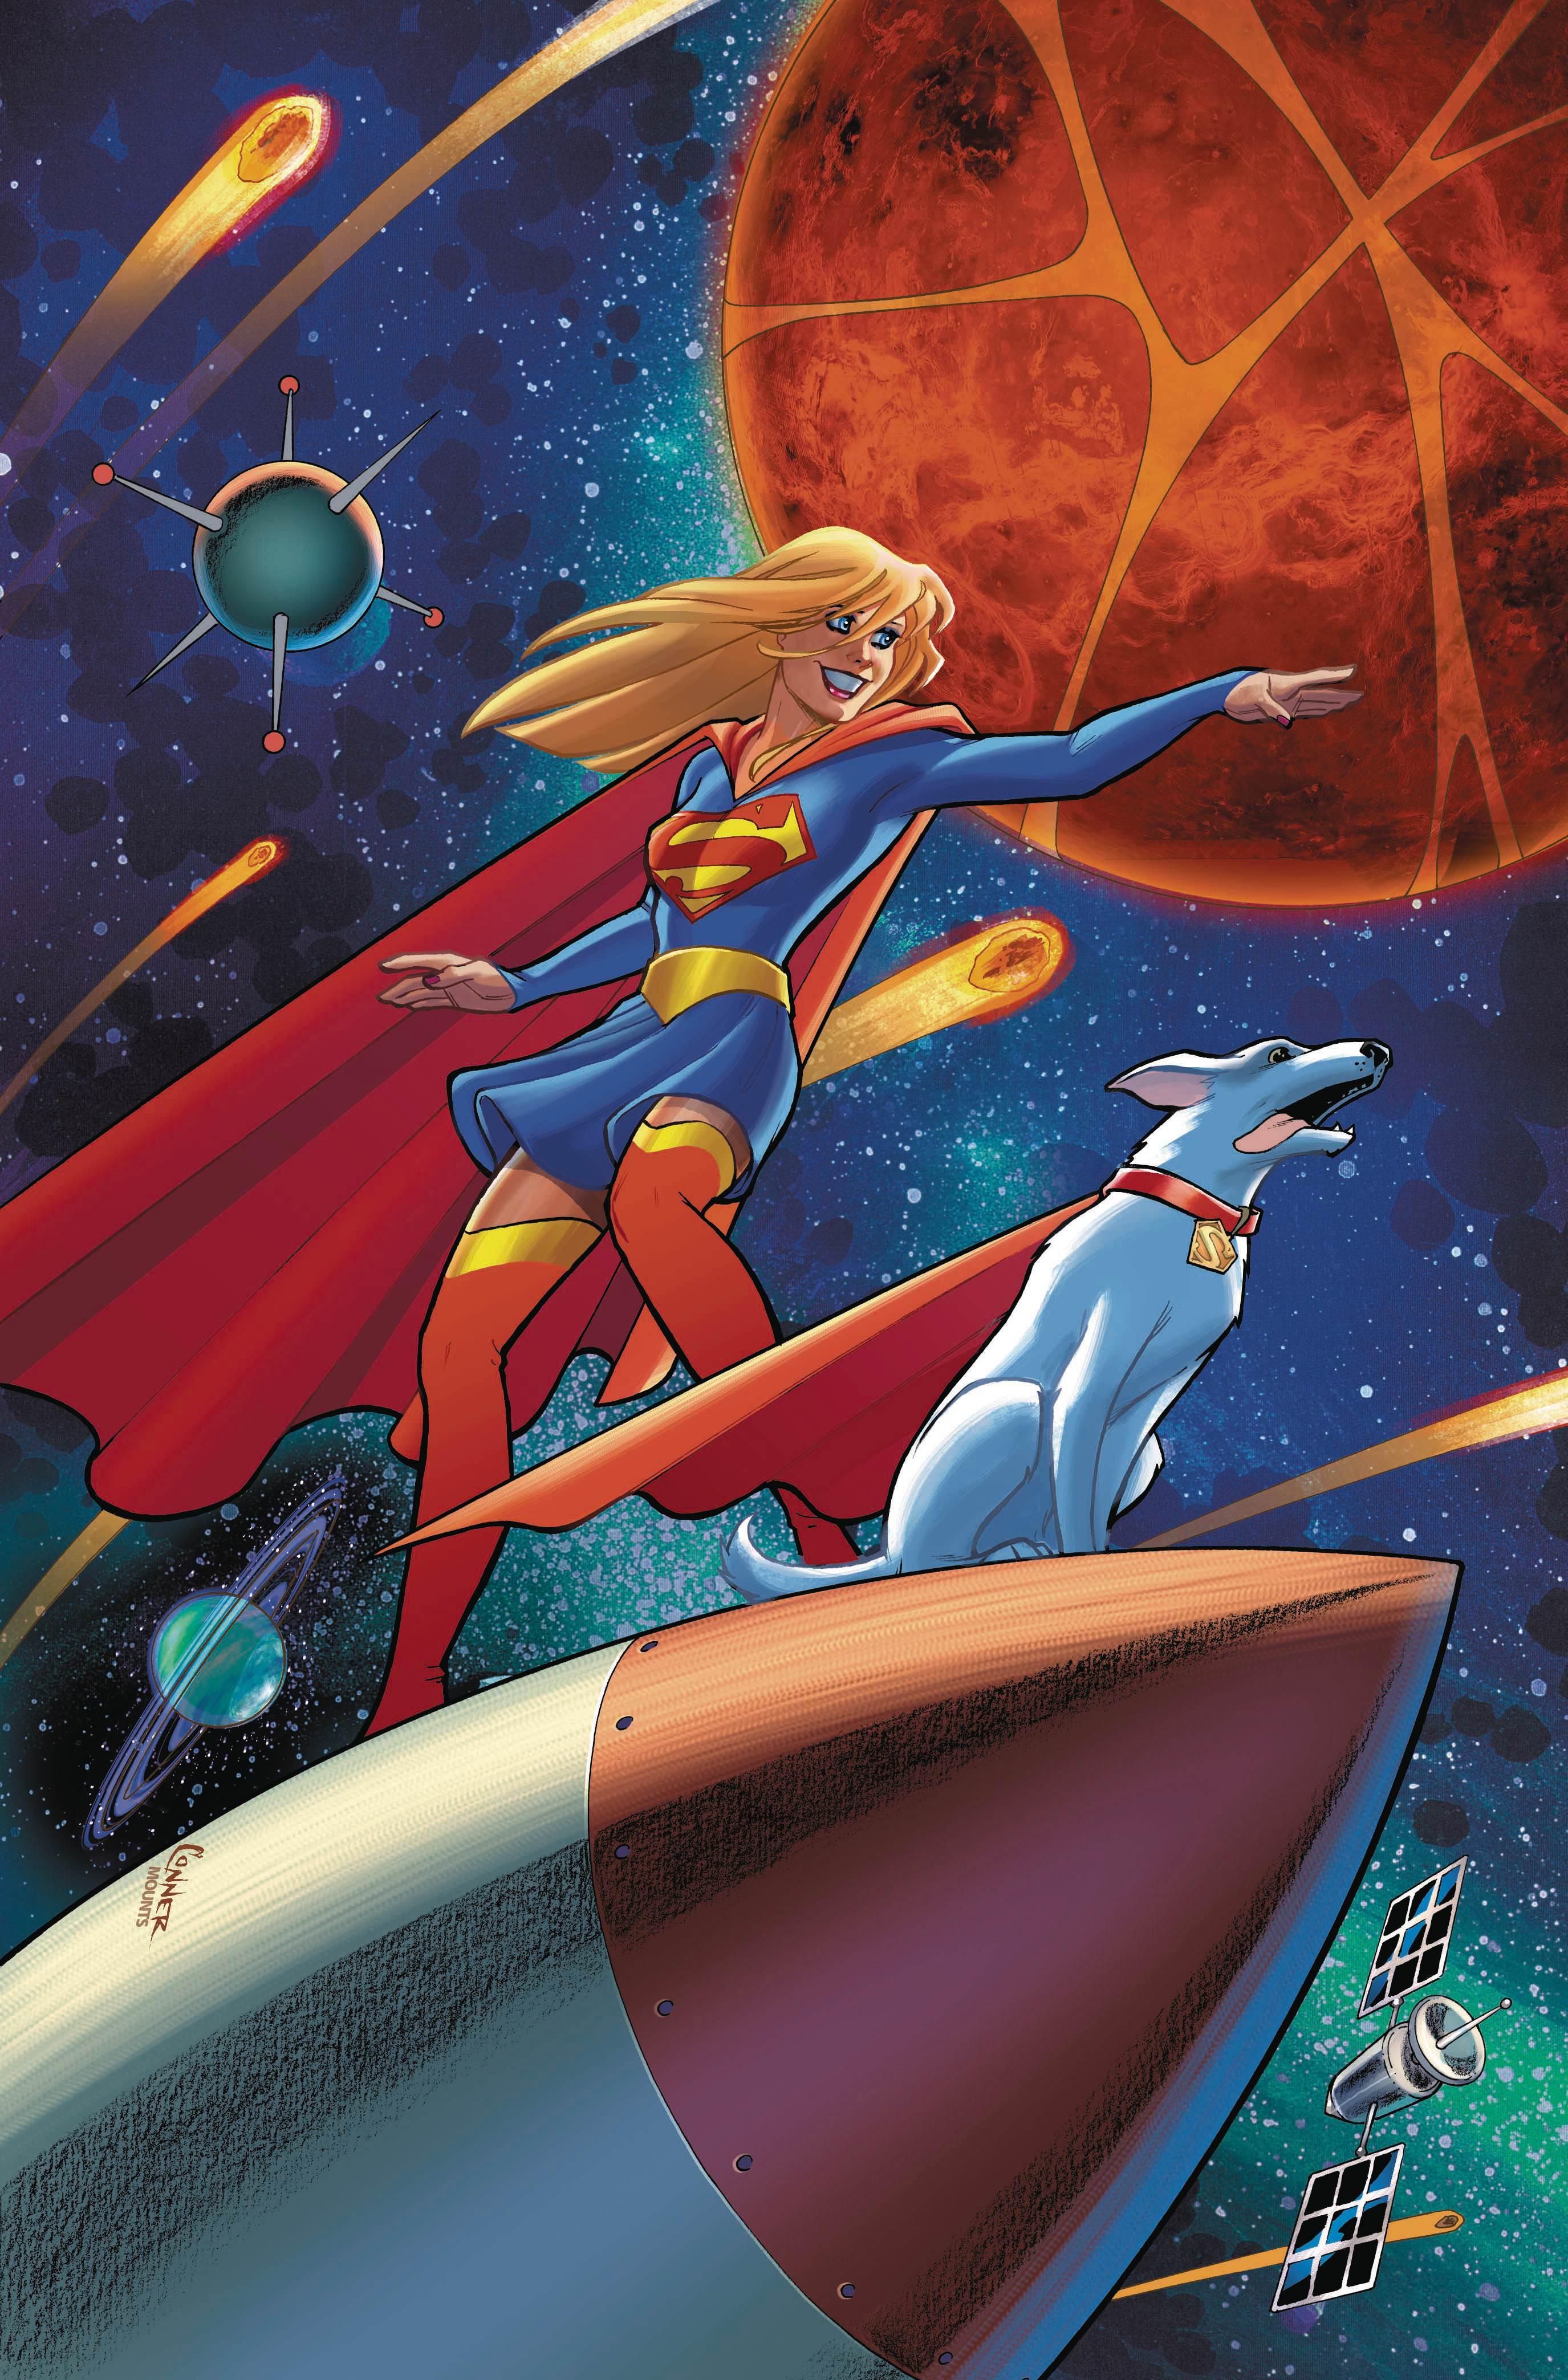 Supergirl Vol 7 23 Variant Textless.jpg